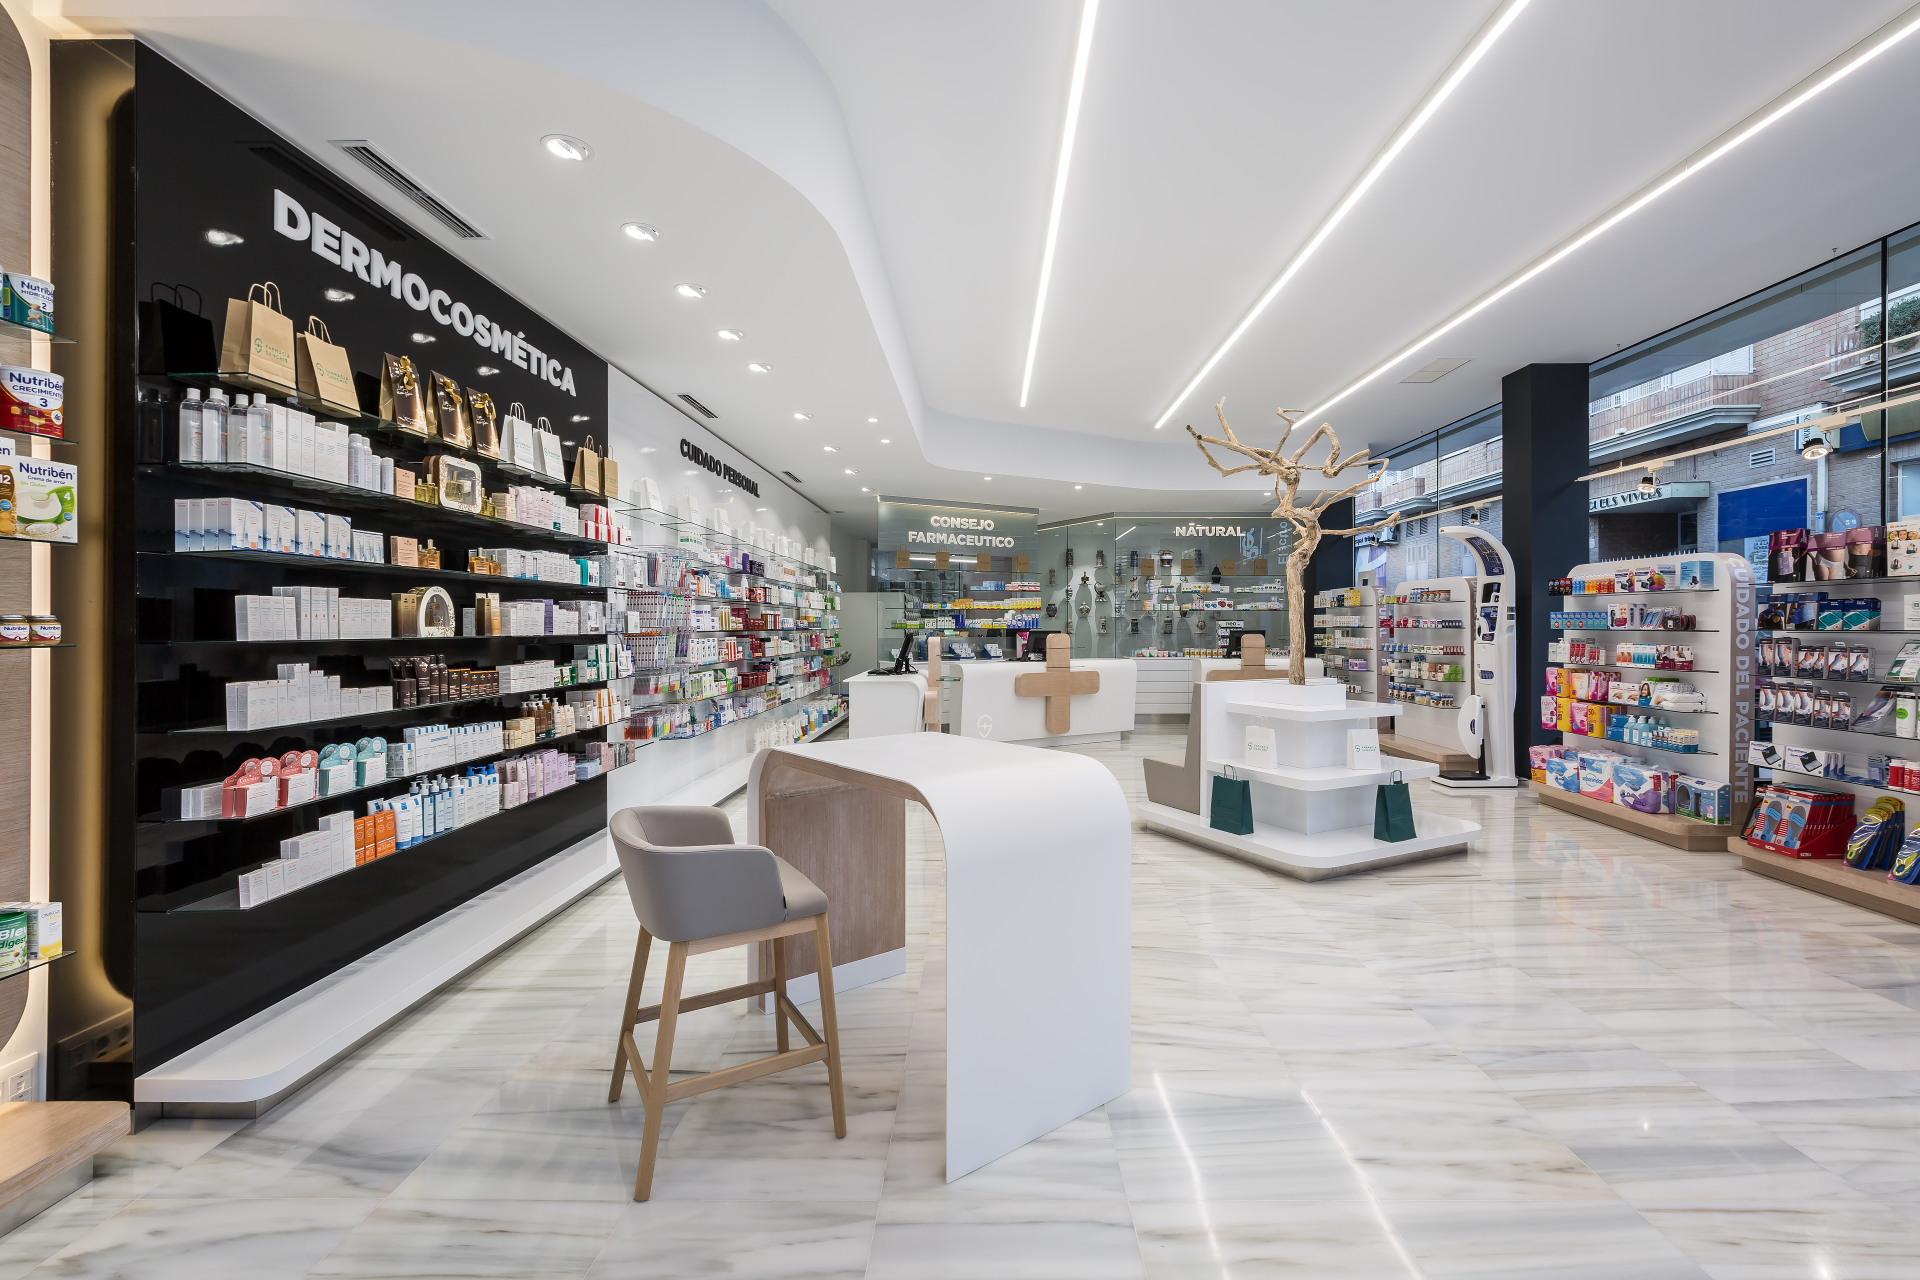 fotografia-arquitectura-valencia-german-cabo-d'estudio-farmacia-sanchis-ribarroja (28)